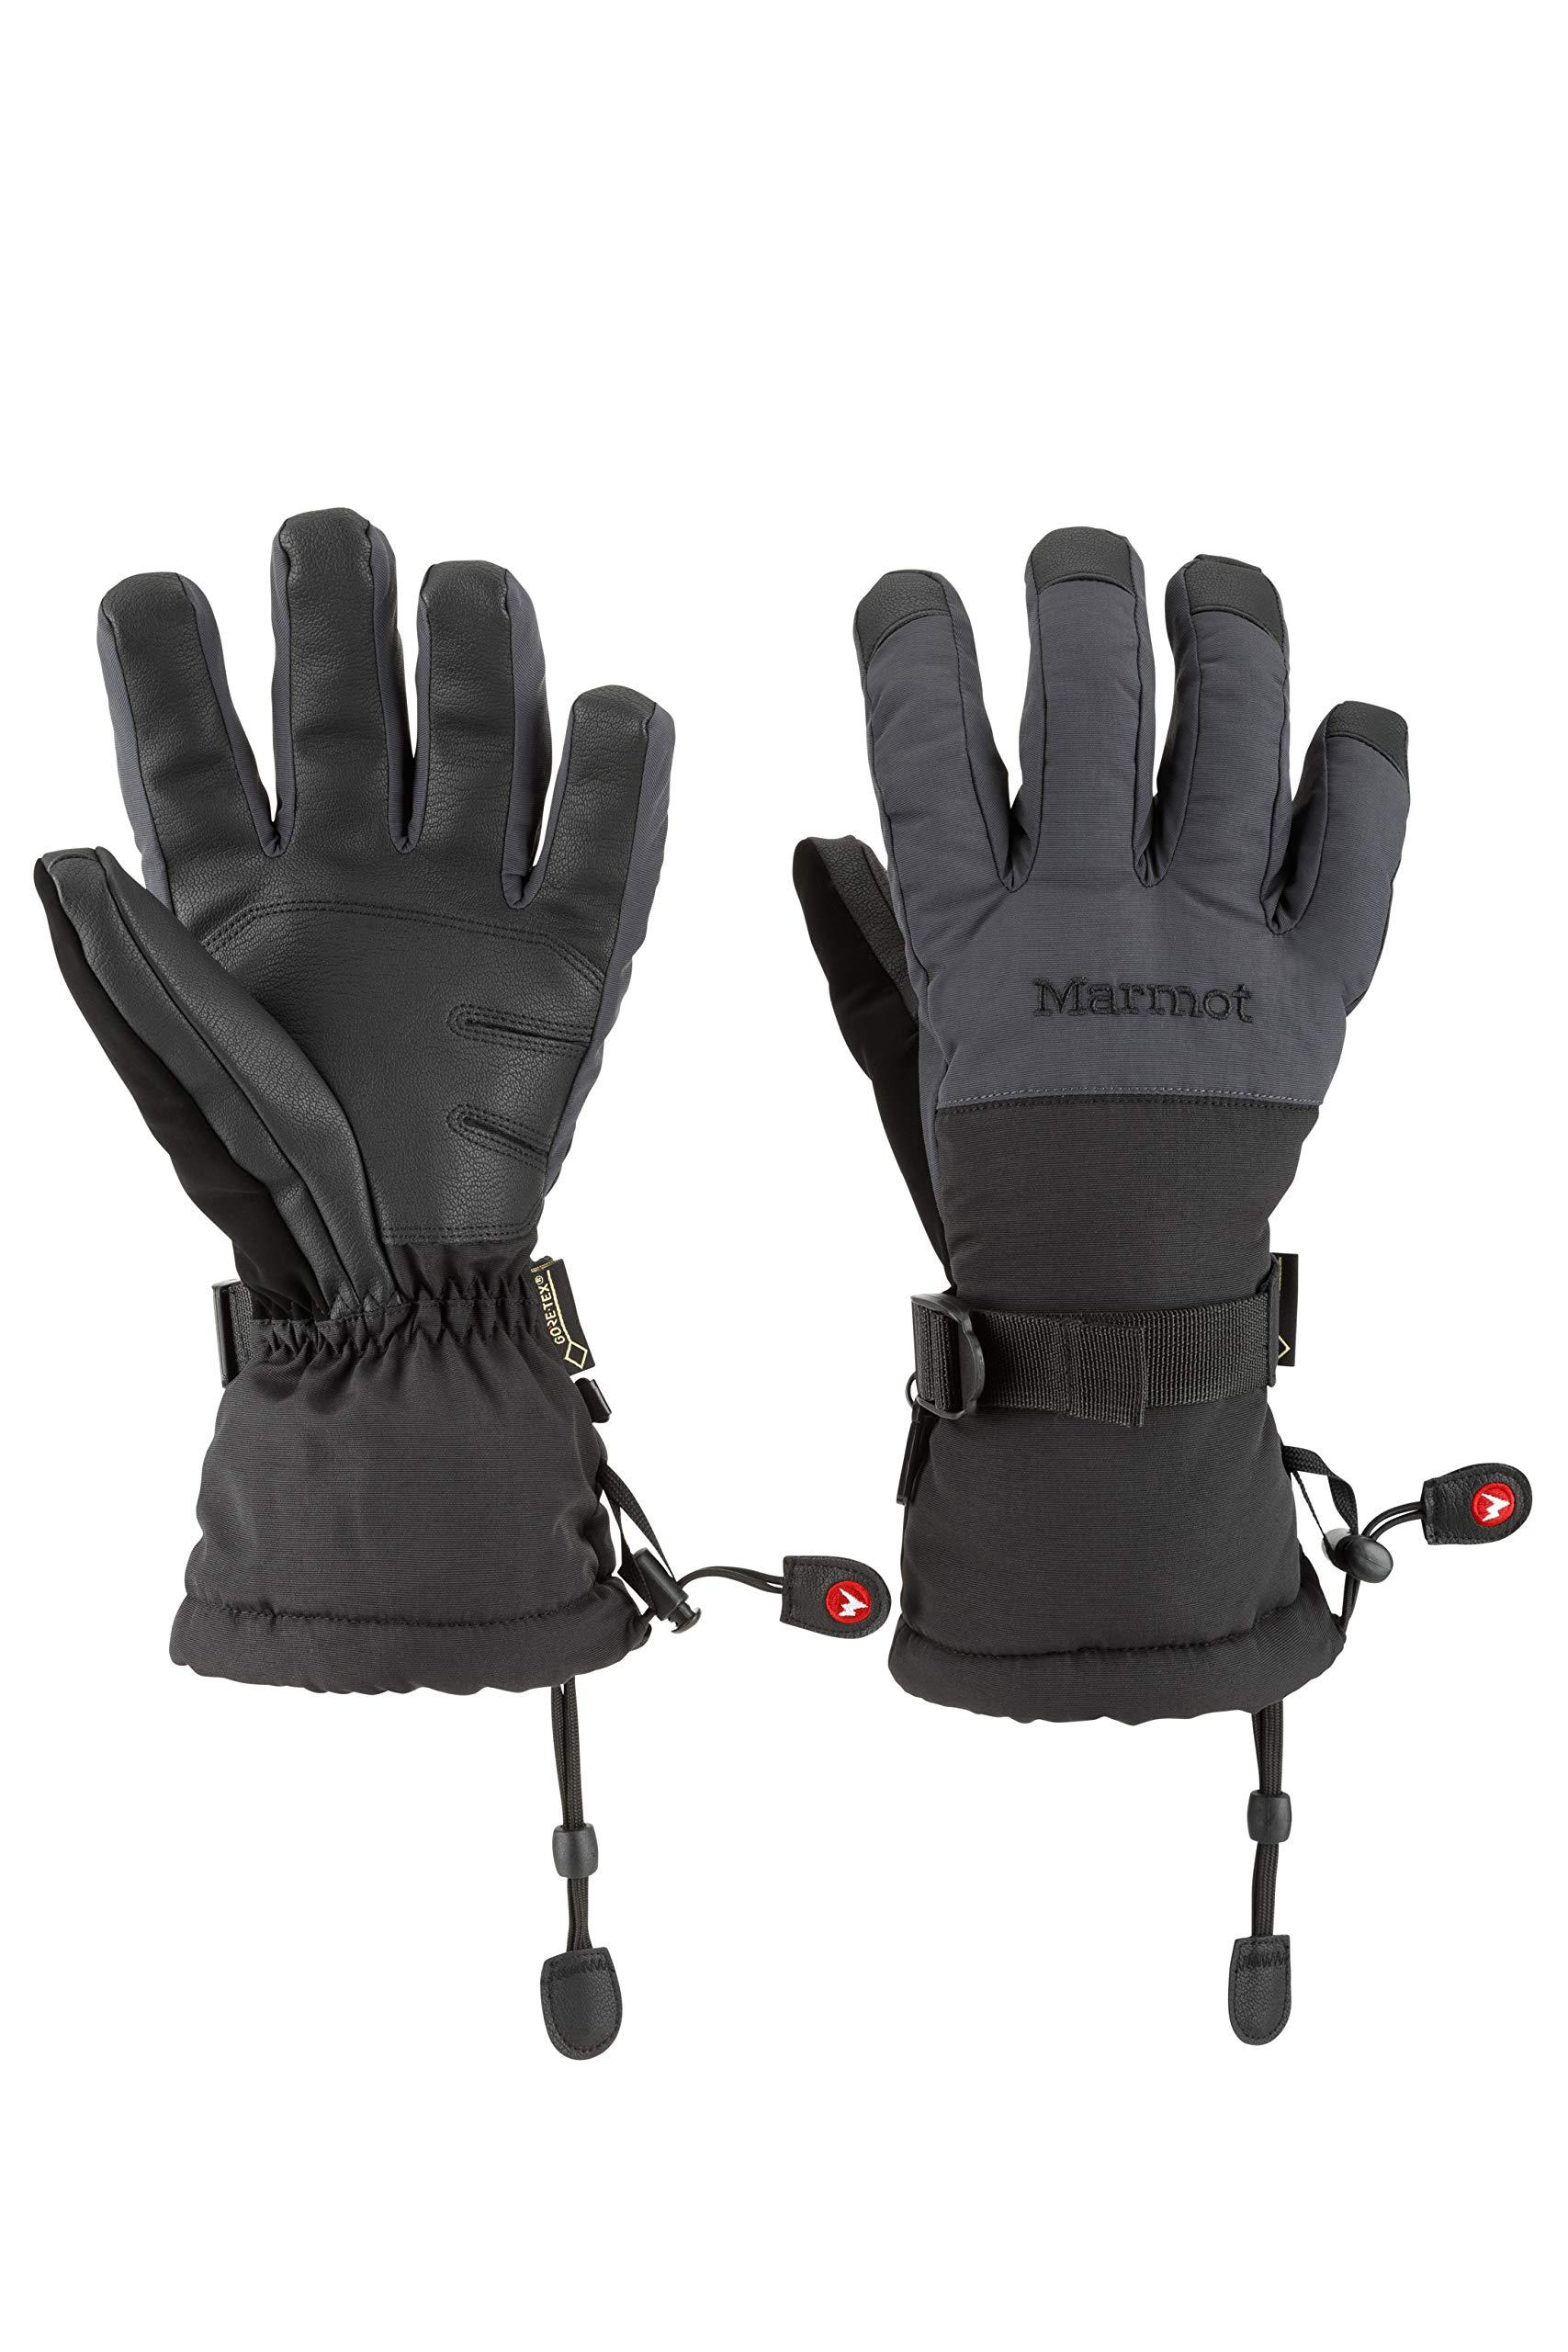 Marmot Men's Granlibakken Glove, Medium, Slate Grey/Black